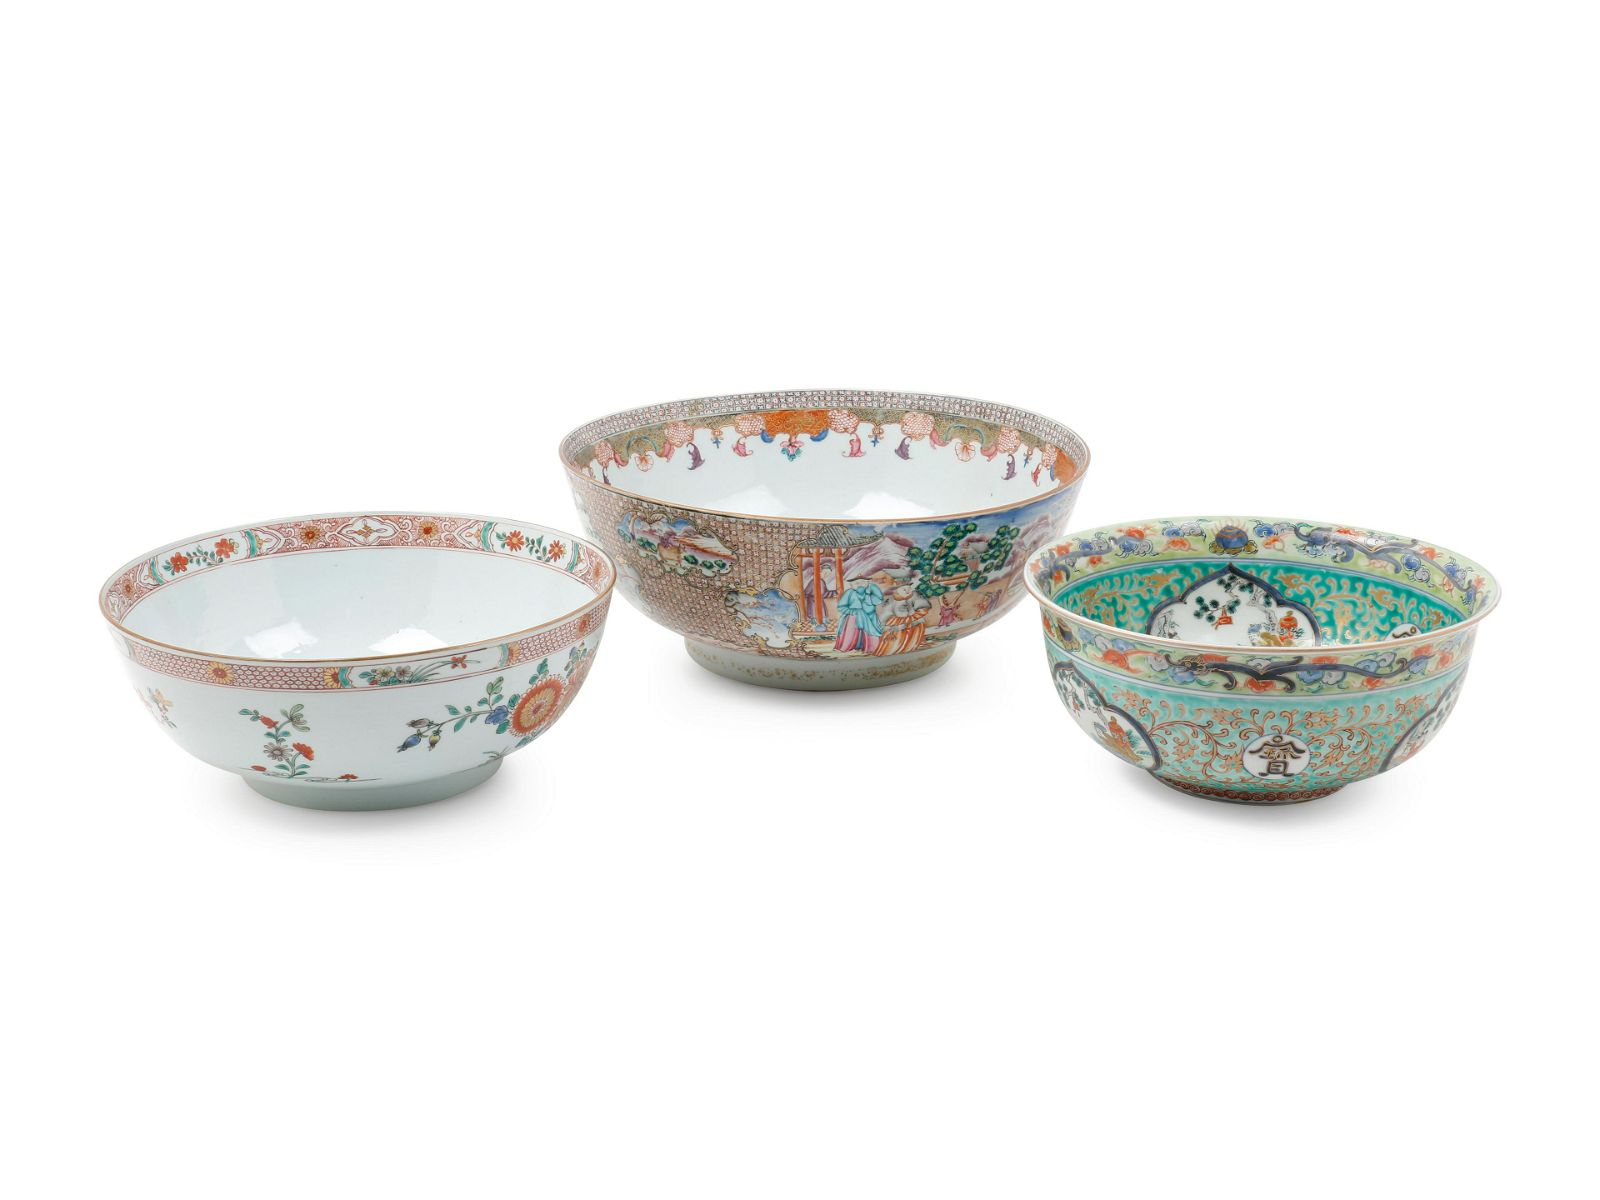 A Large Chinese Export Rose Medallion Porcelain Bowl